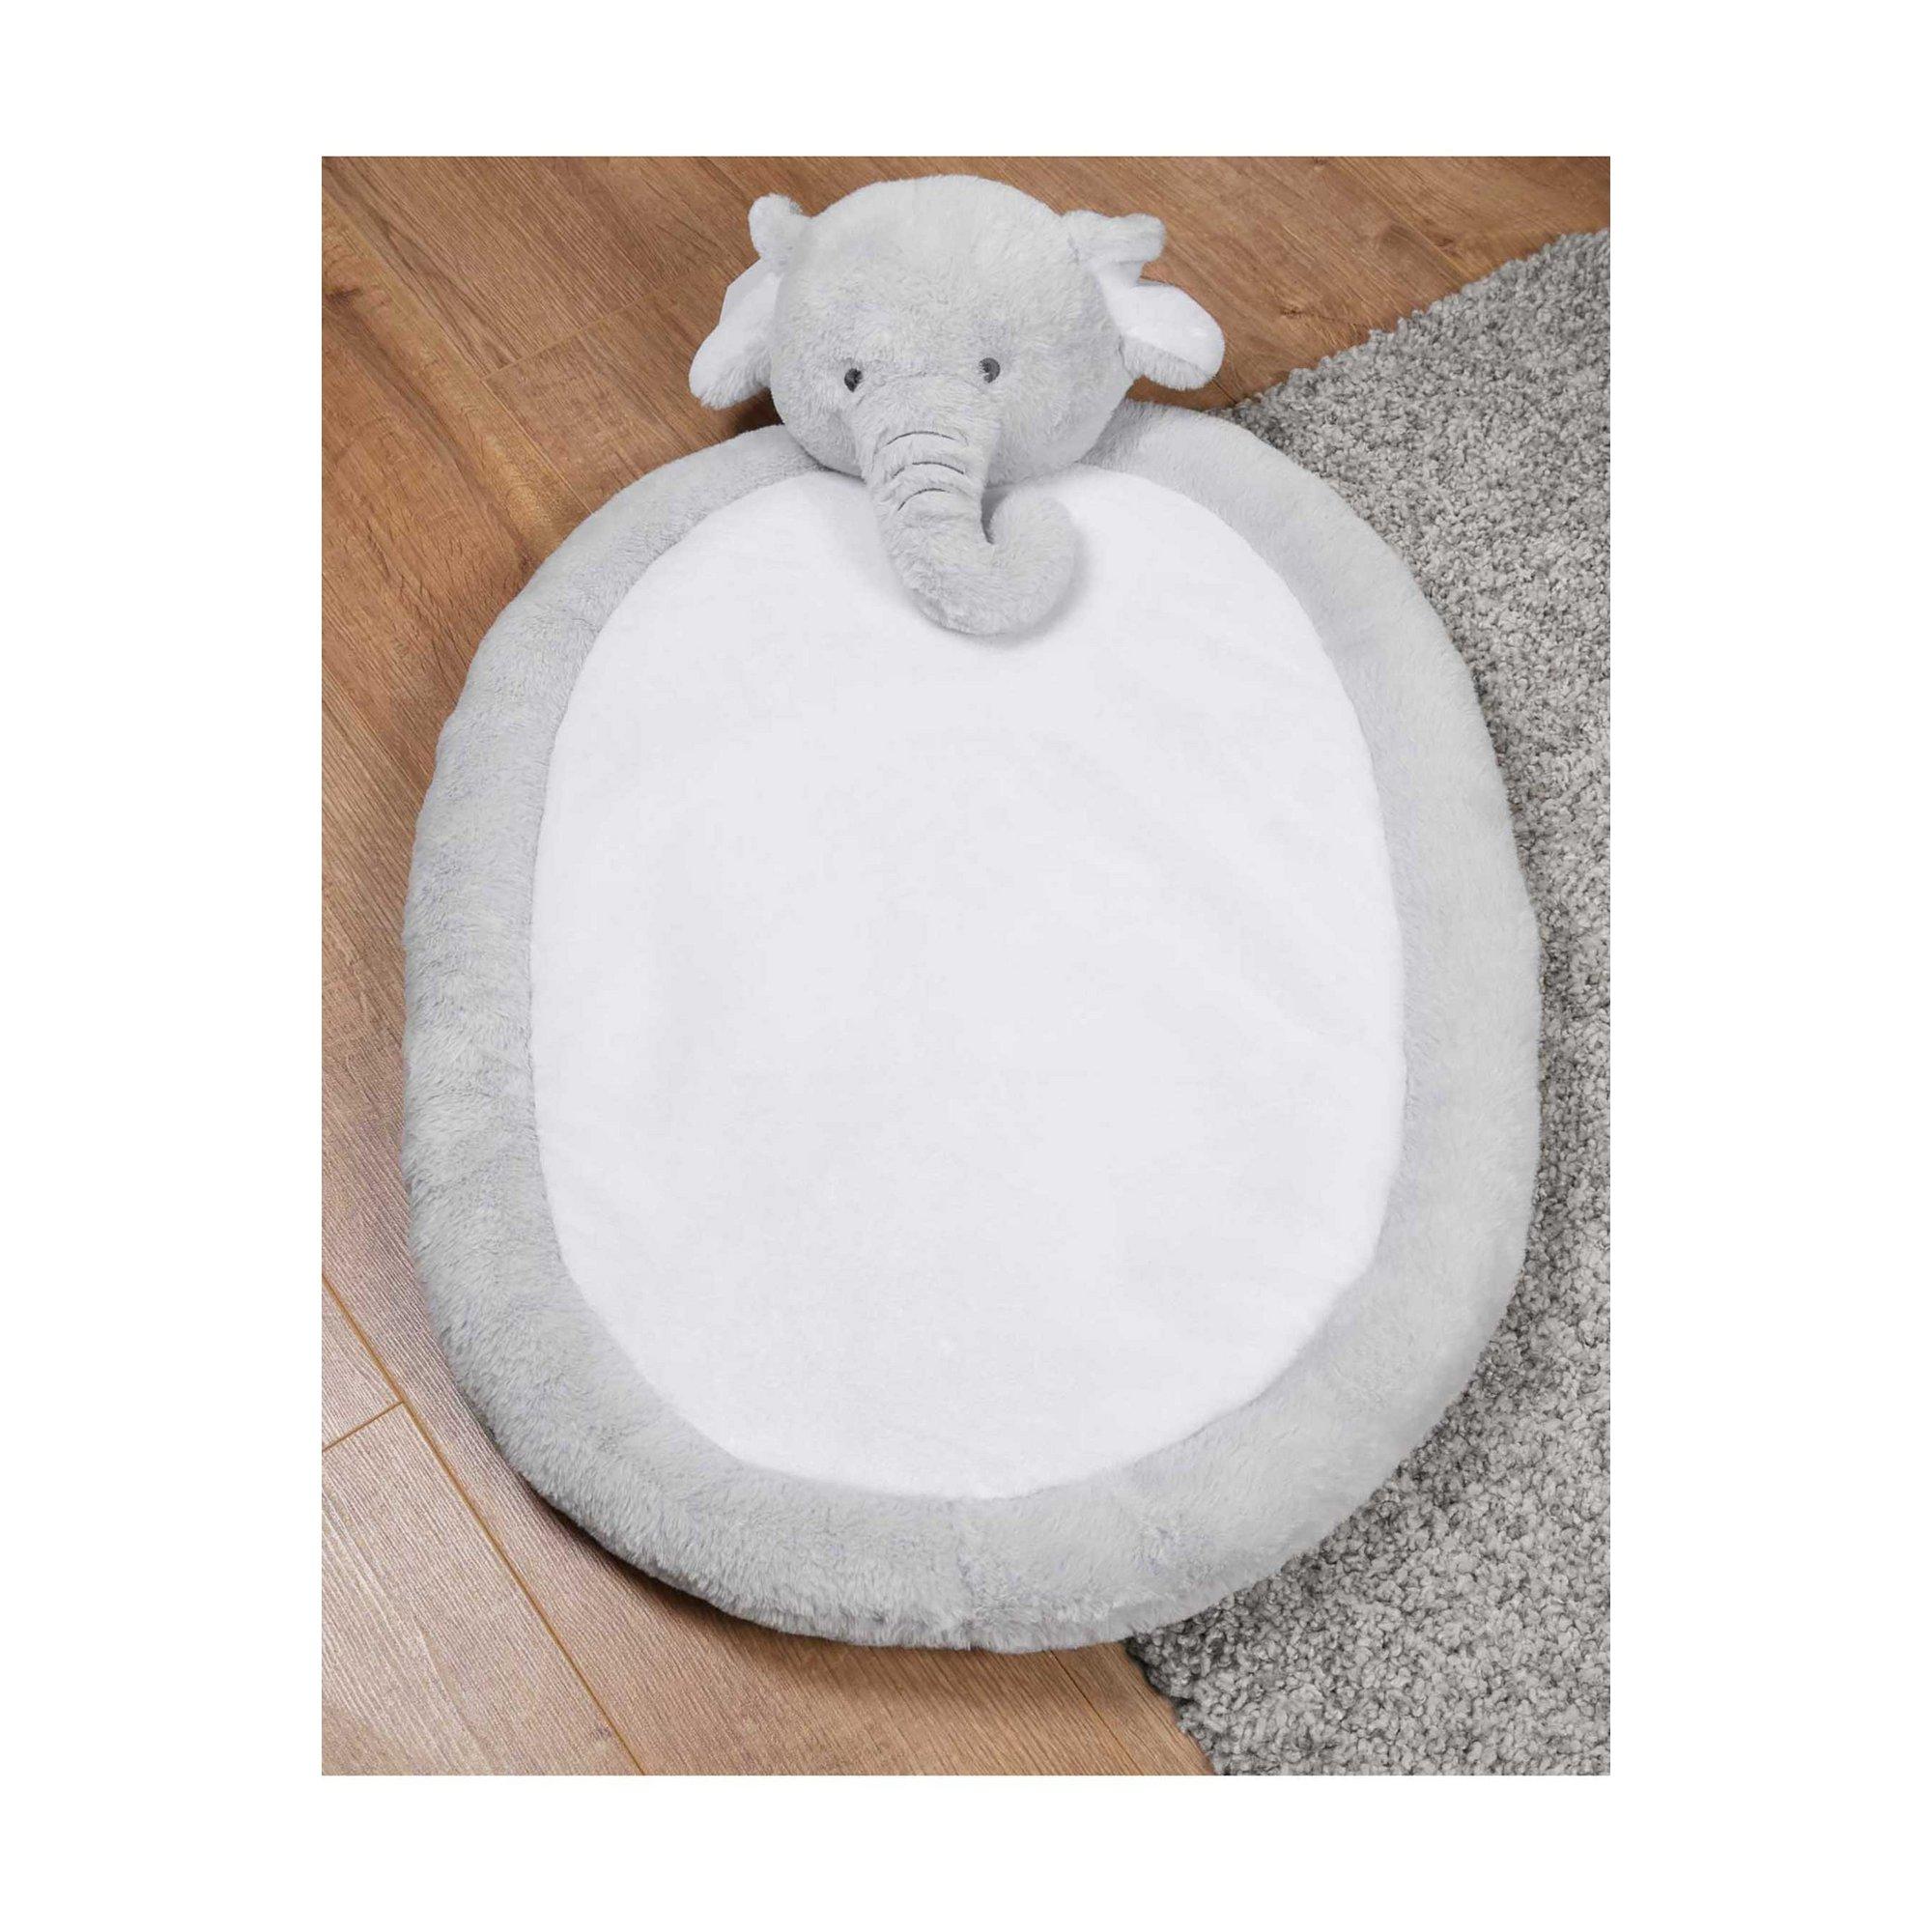 Image of Bambino Soft Oval Playmat - Elephant